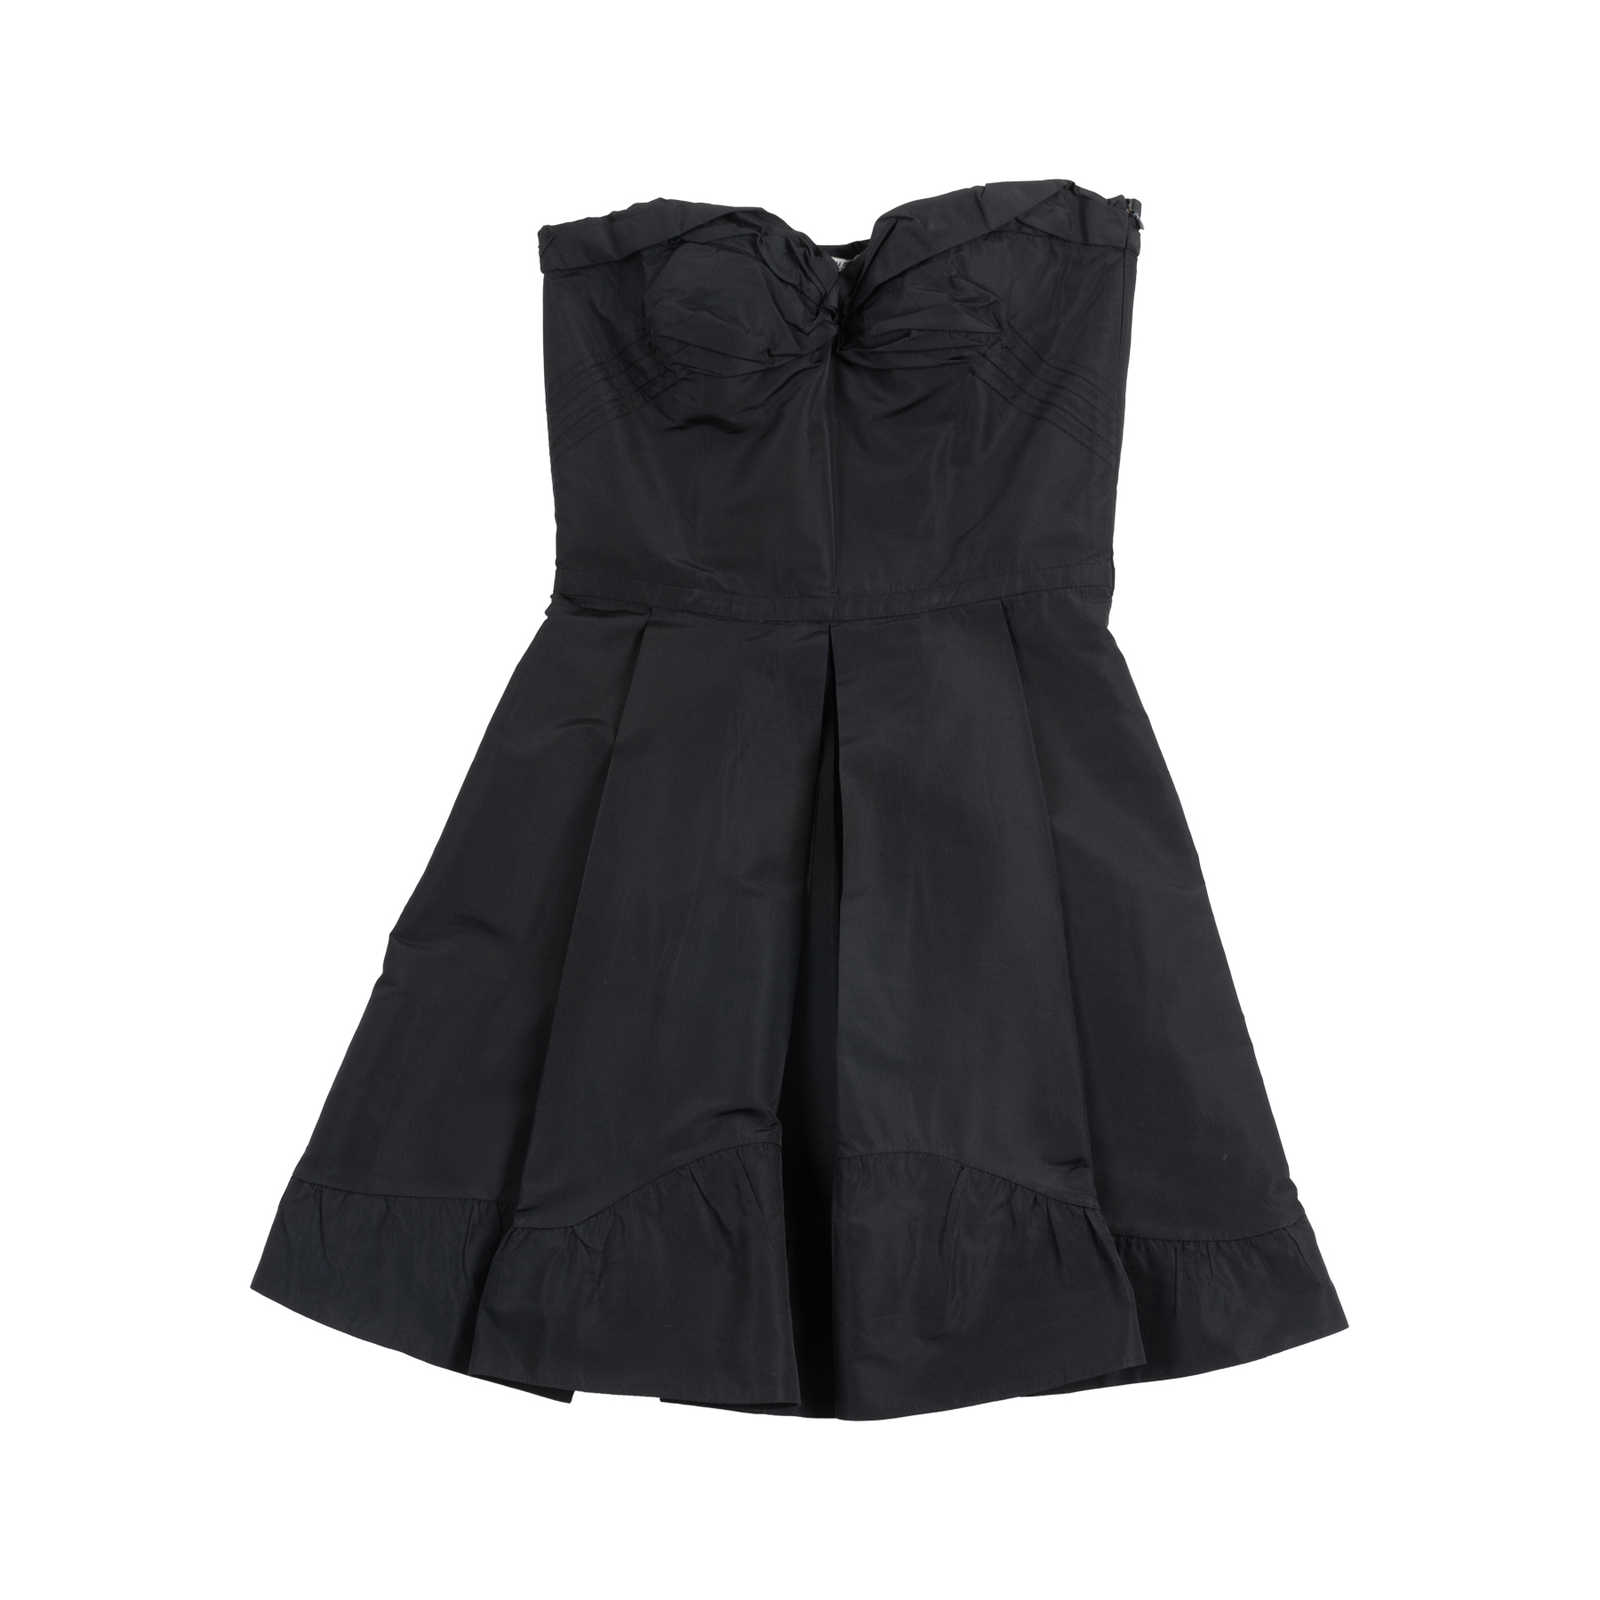 4ad86f7e973c9 Authentic Second Hand Miu Miu Black Bustier Dress (PSS-049-00062) ...